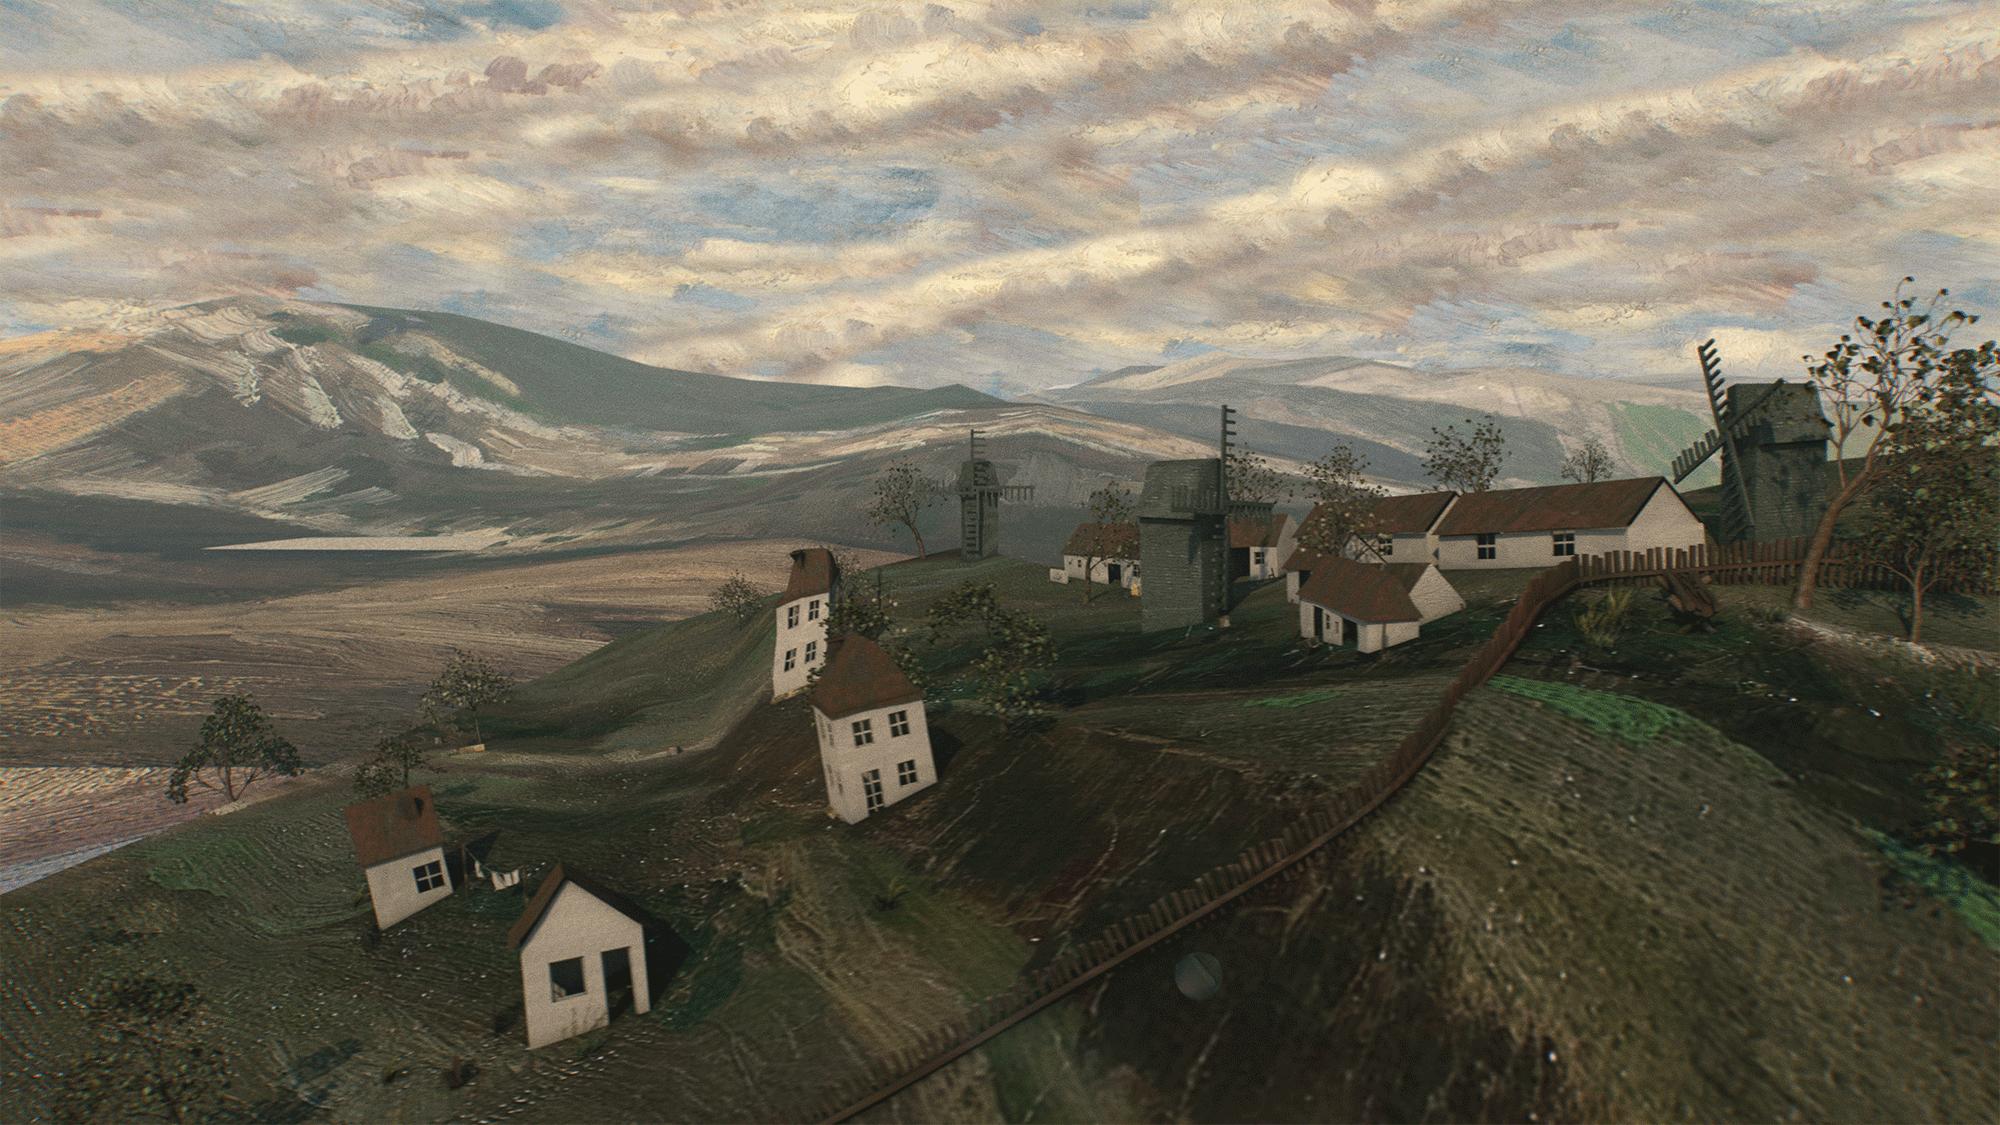 Van_Gogh_Maciek_Janicki_Still__0020_Layer-4.png